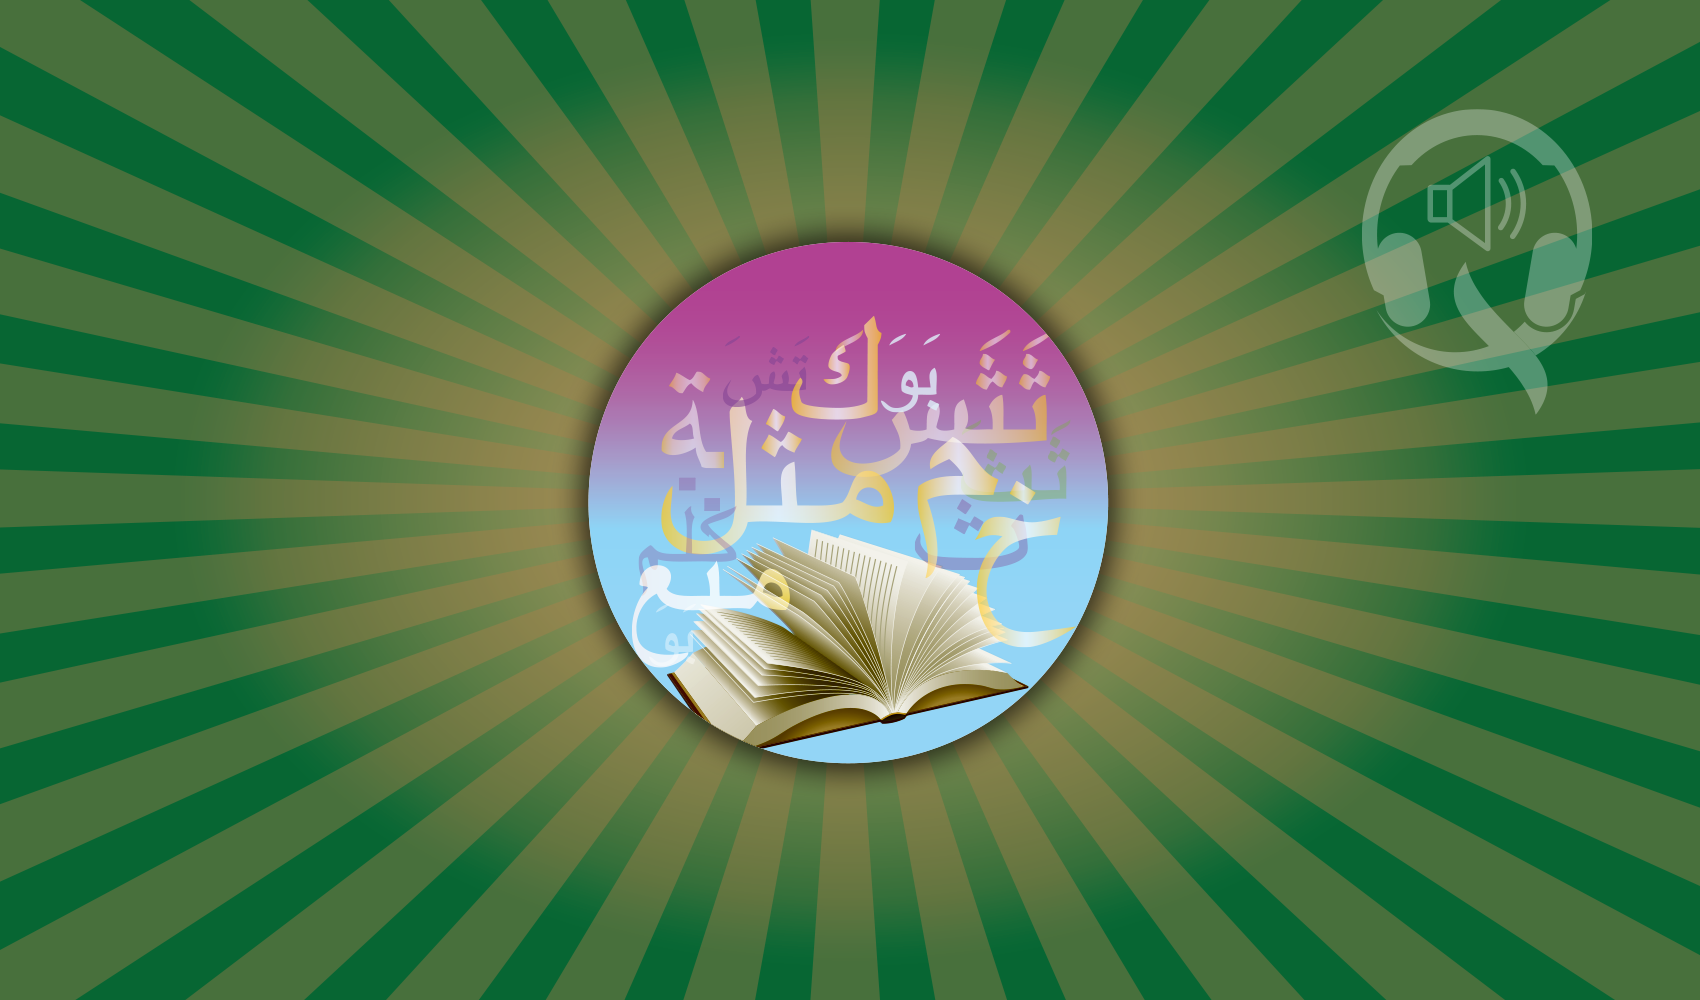 Qur'an Recitation Talks Audio